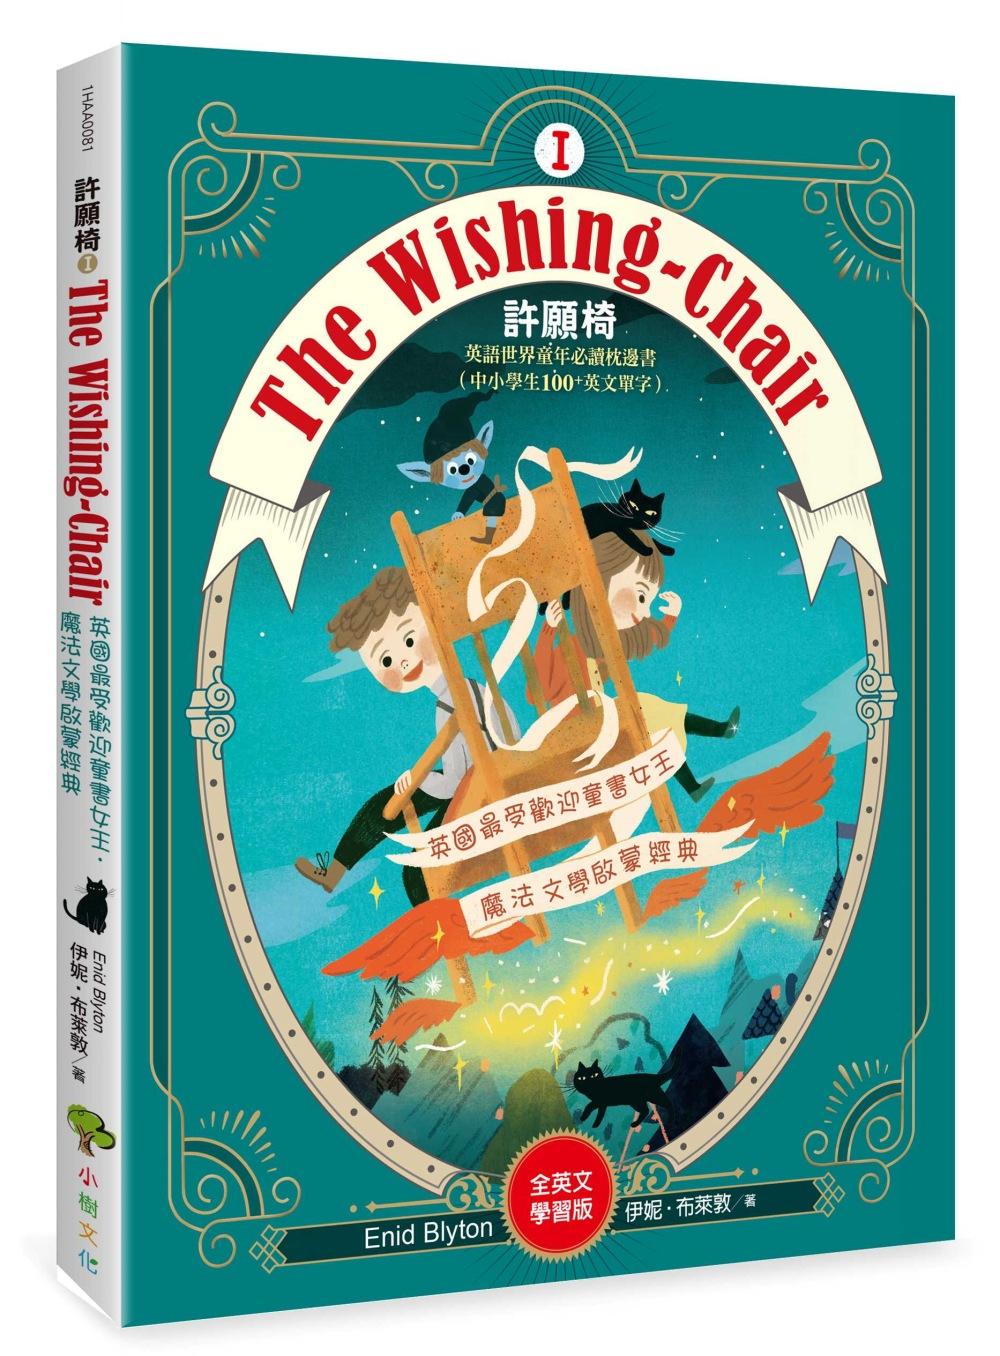 The Wishing-Chair 許願椅1【全英文學習版】:英文世界童年必讀枕邊書(中小學生100 + 英文單字)